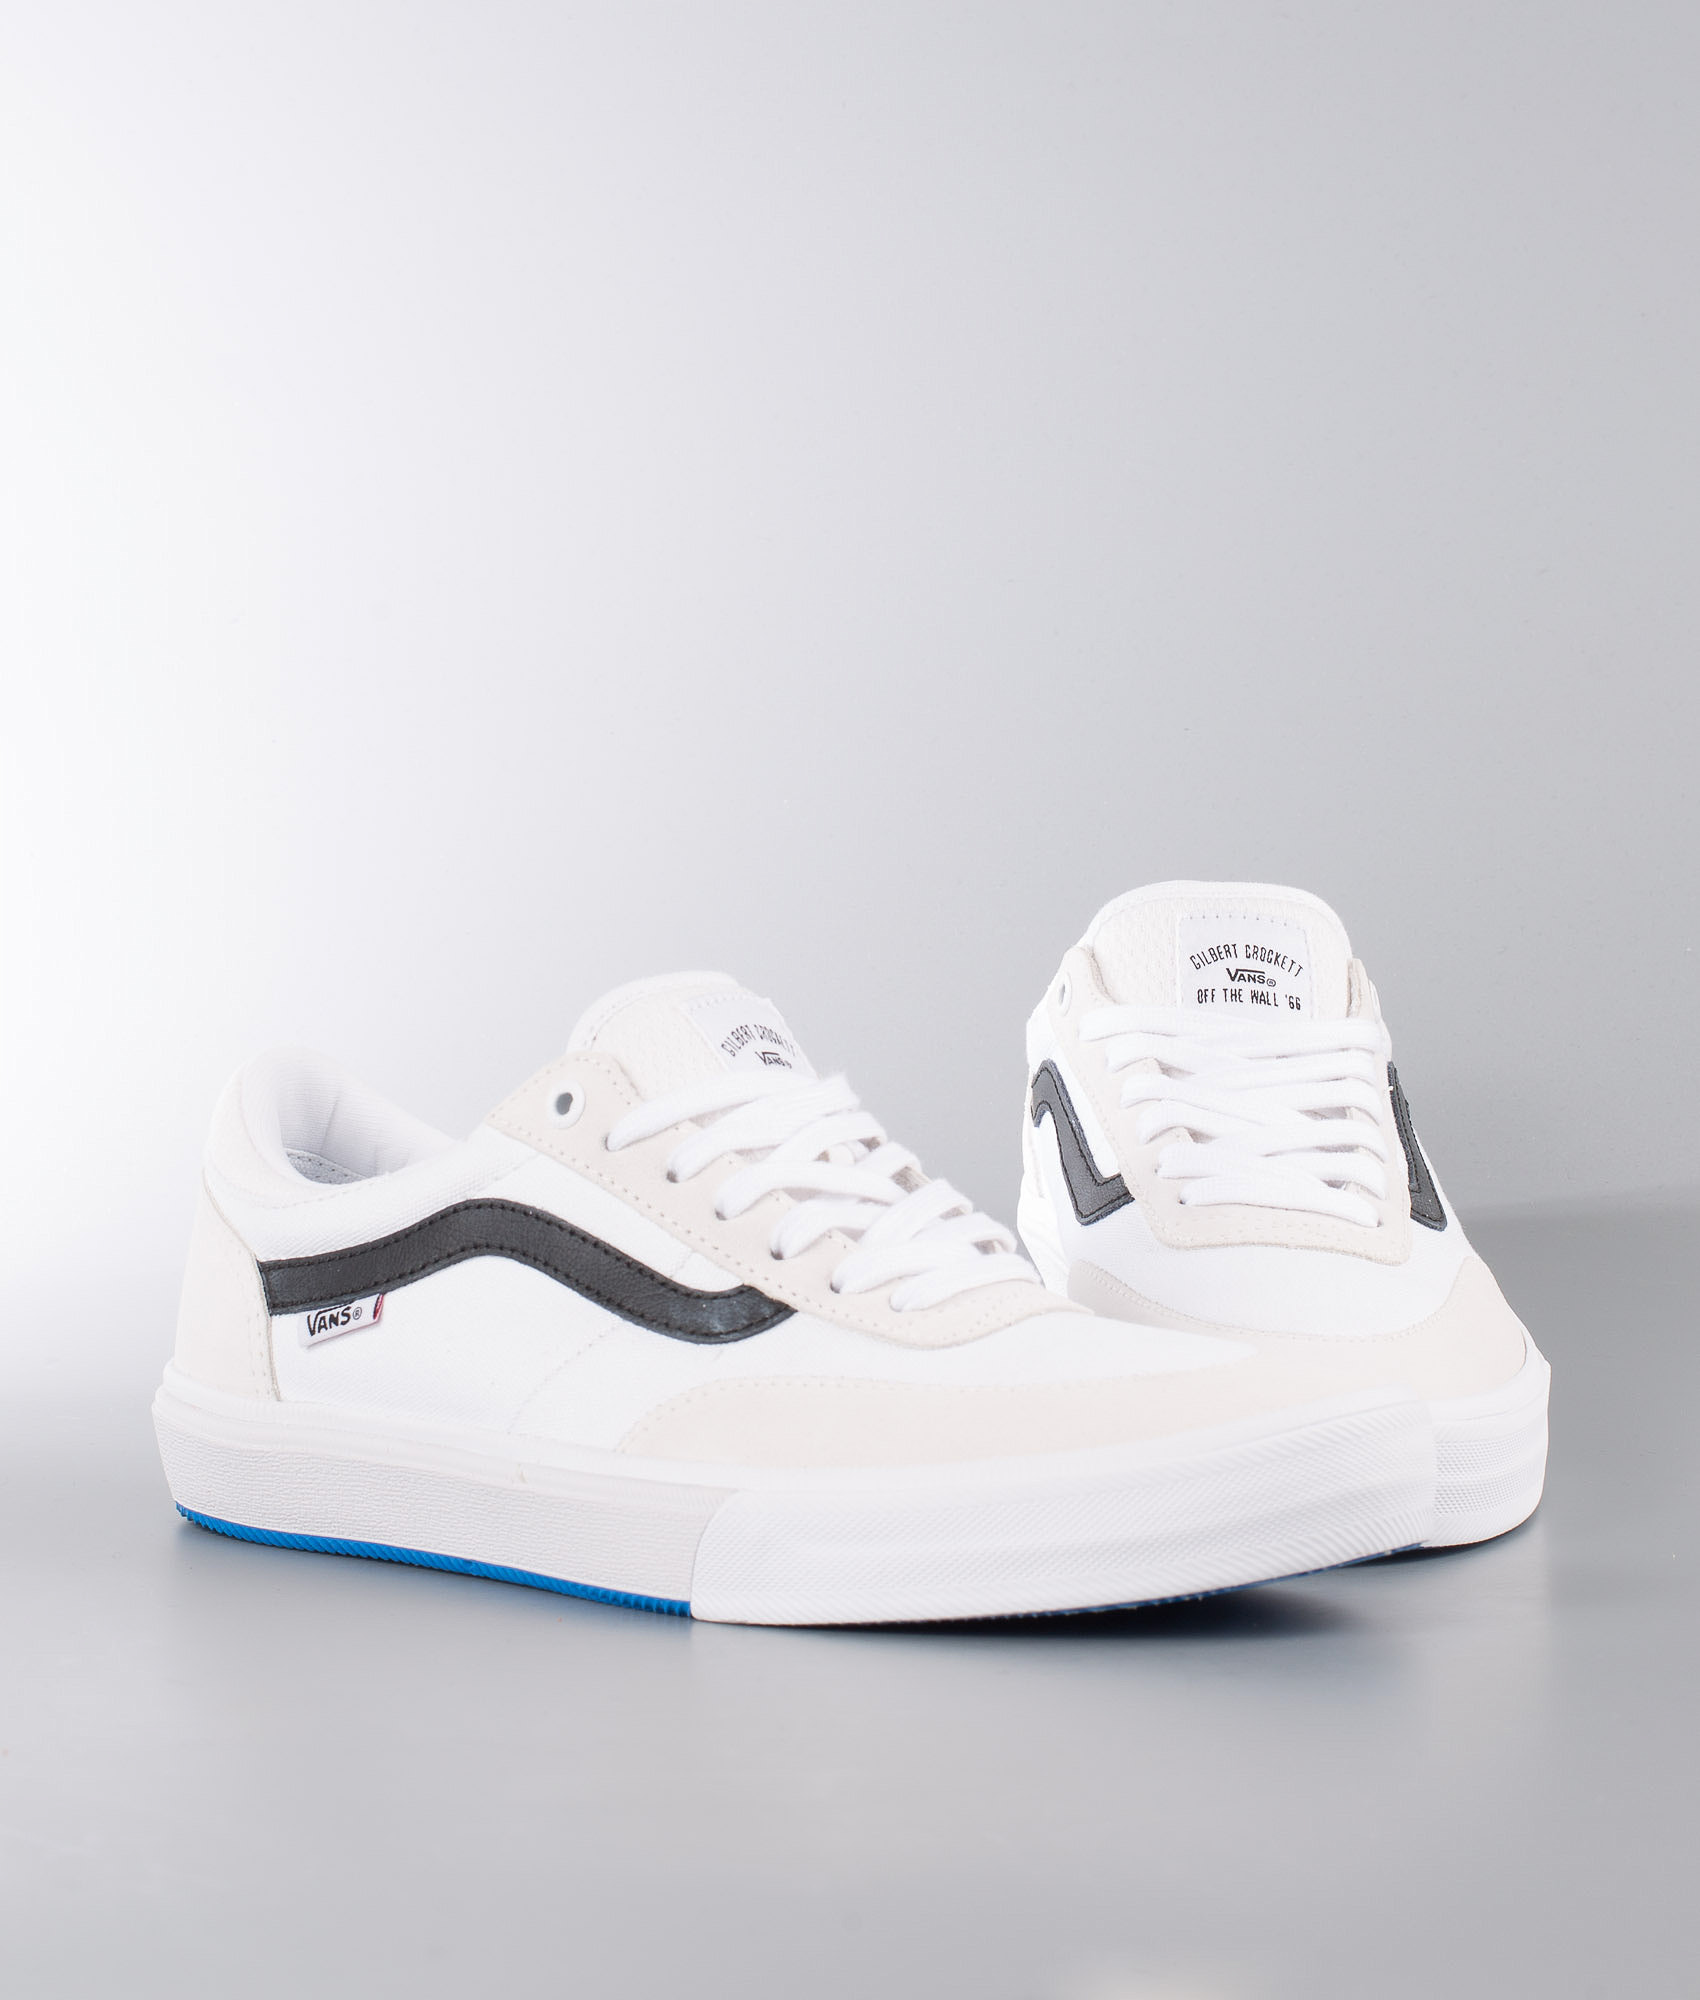 e265ccc95ac Vans Gilbert Crockett 2 Pro Shoes True White Black - Ridestore.com